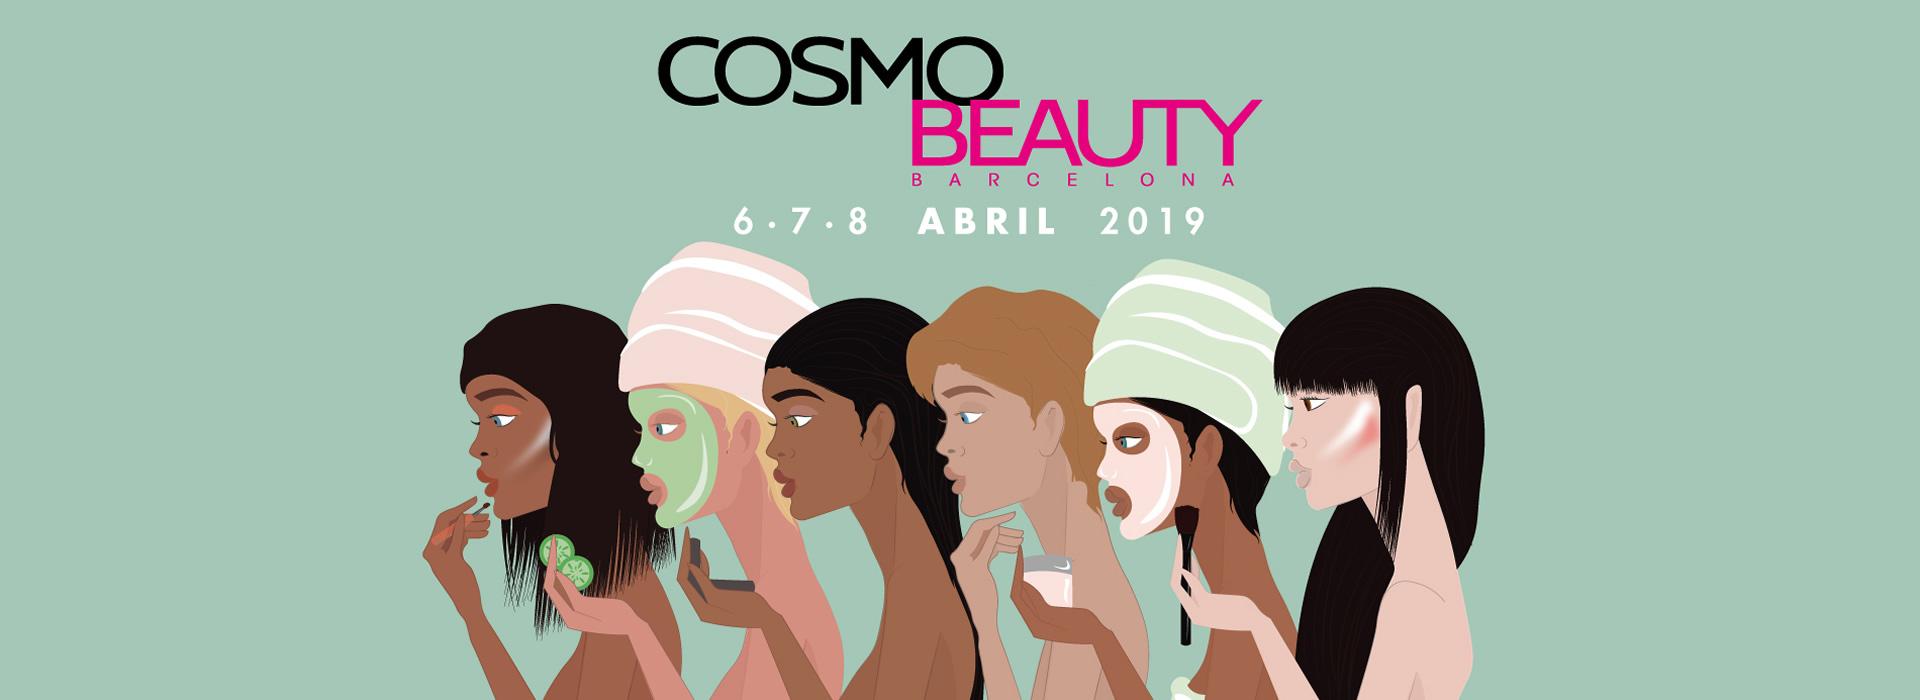 Cosmobeauty-Barcelona-Imagen-Congreso